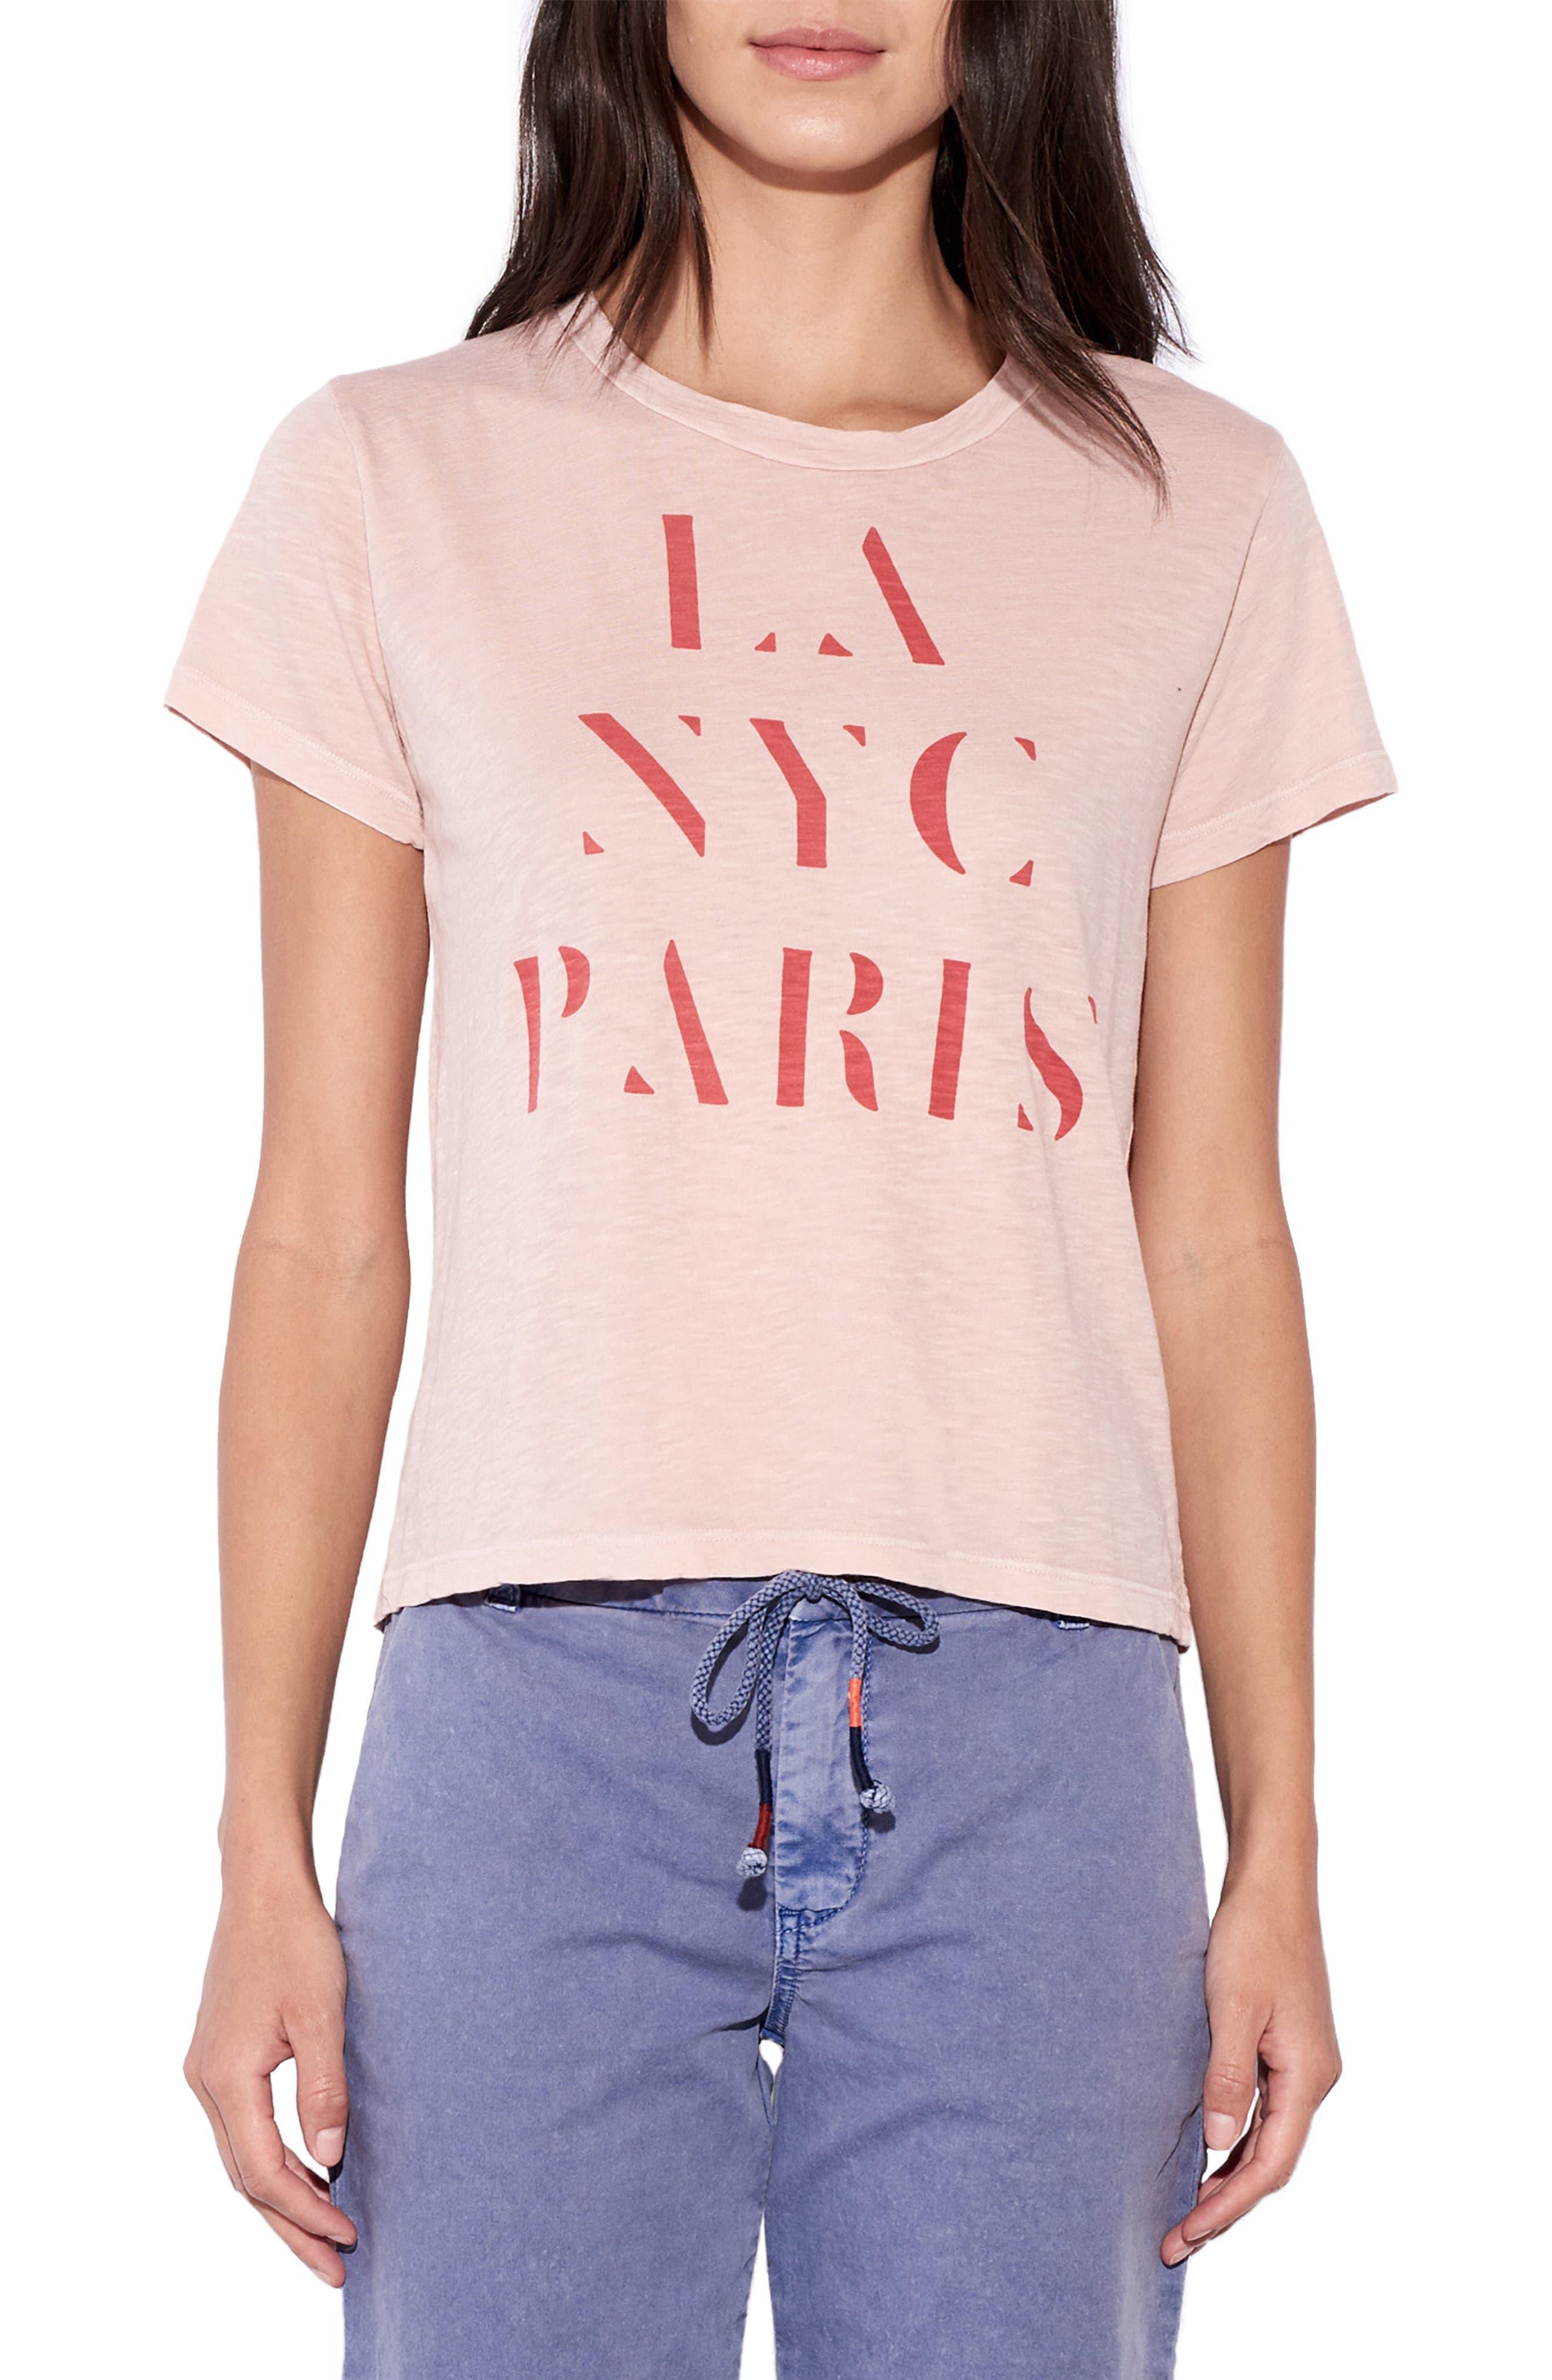 SUNDRY LA/NYC/Paris Graphic Tee, Main, color, PIGMENT BLUSH